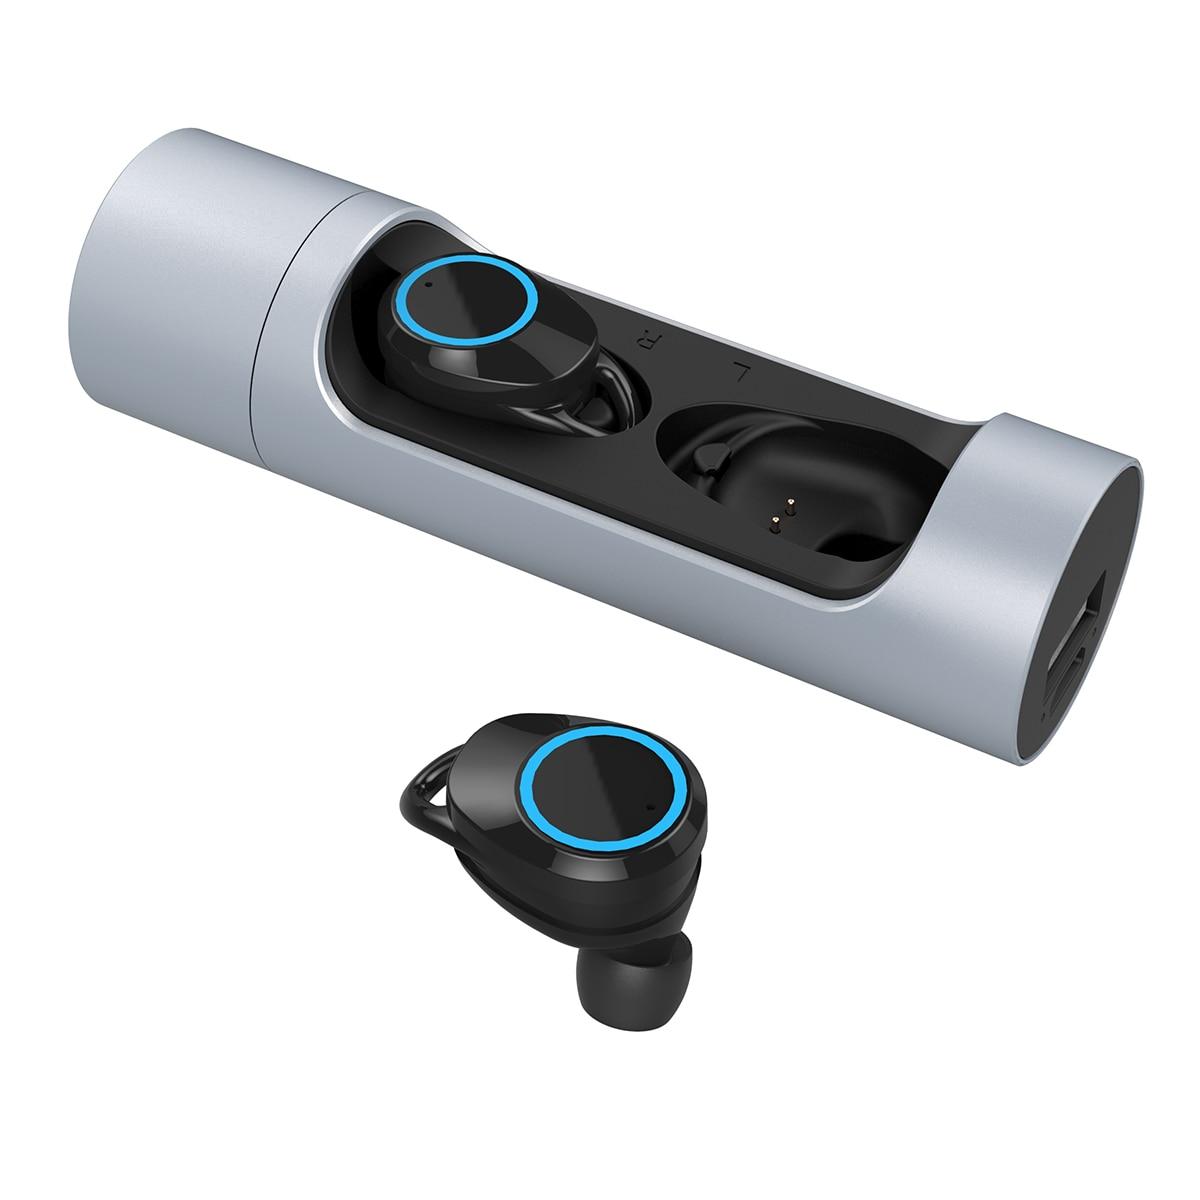 JRGK Tragbare Drahtlose Kopfhörer Bluetooth 5,0 Headset Ohrhörer Hohe Sound Binaural Kopfhörer Mit Magnetic Charging BOX Buchse